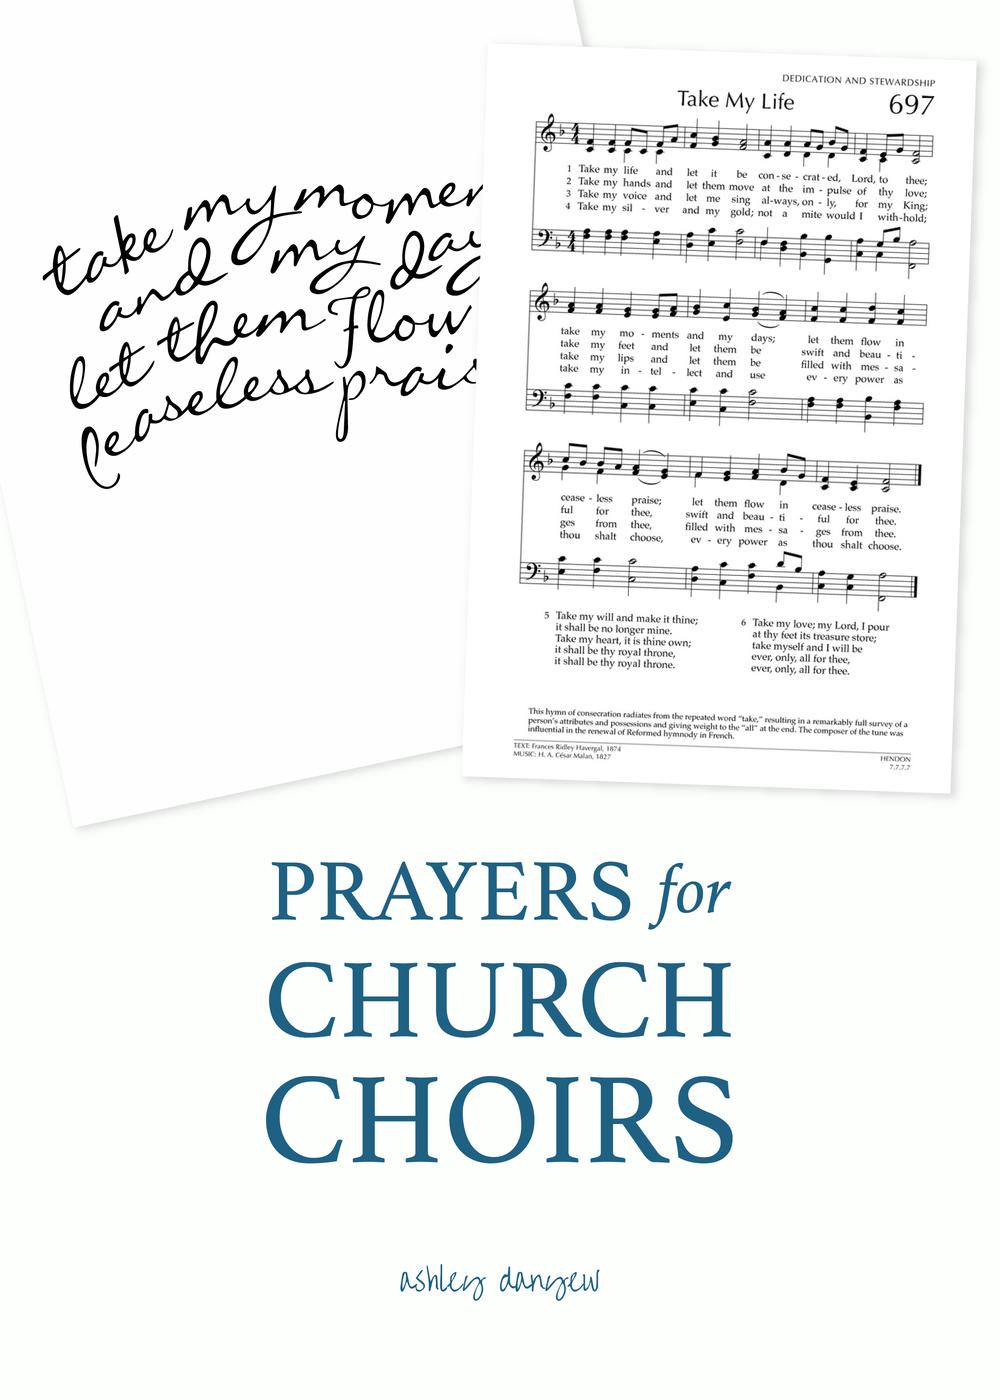 Copy of Prayers for Church Choirs